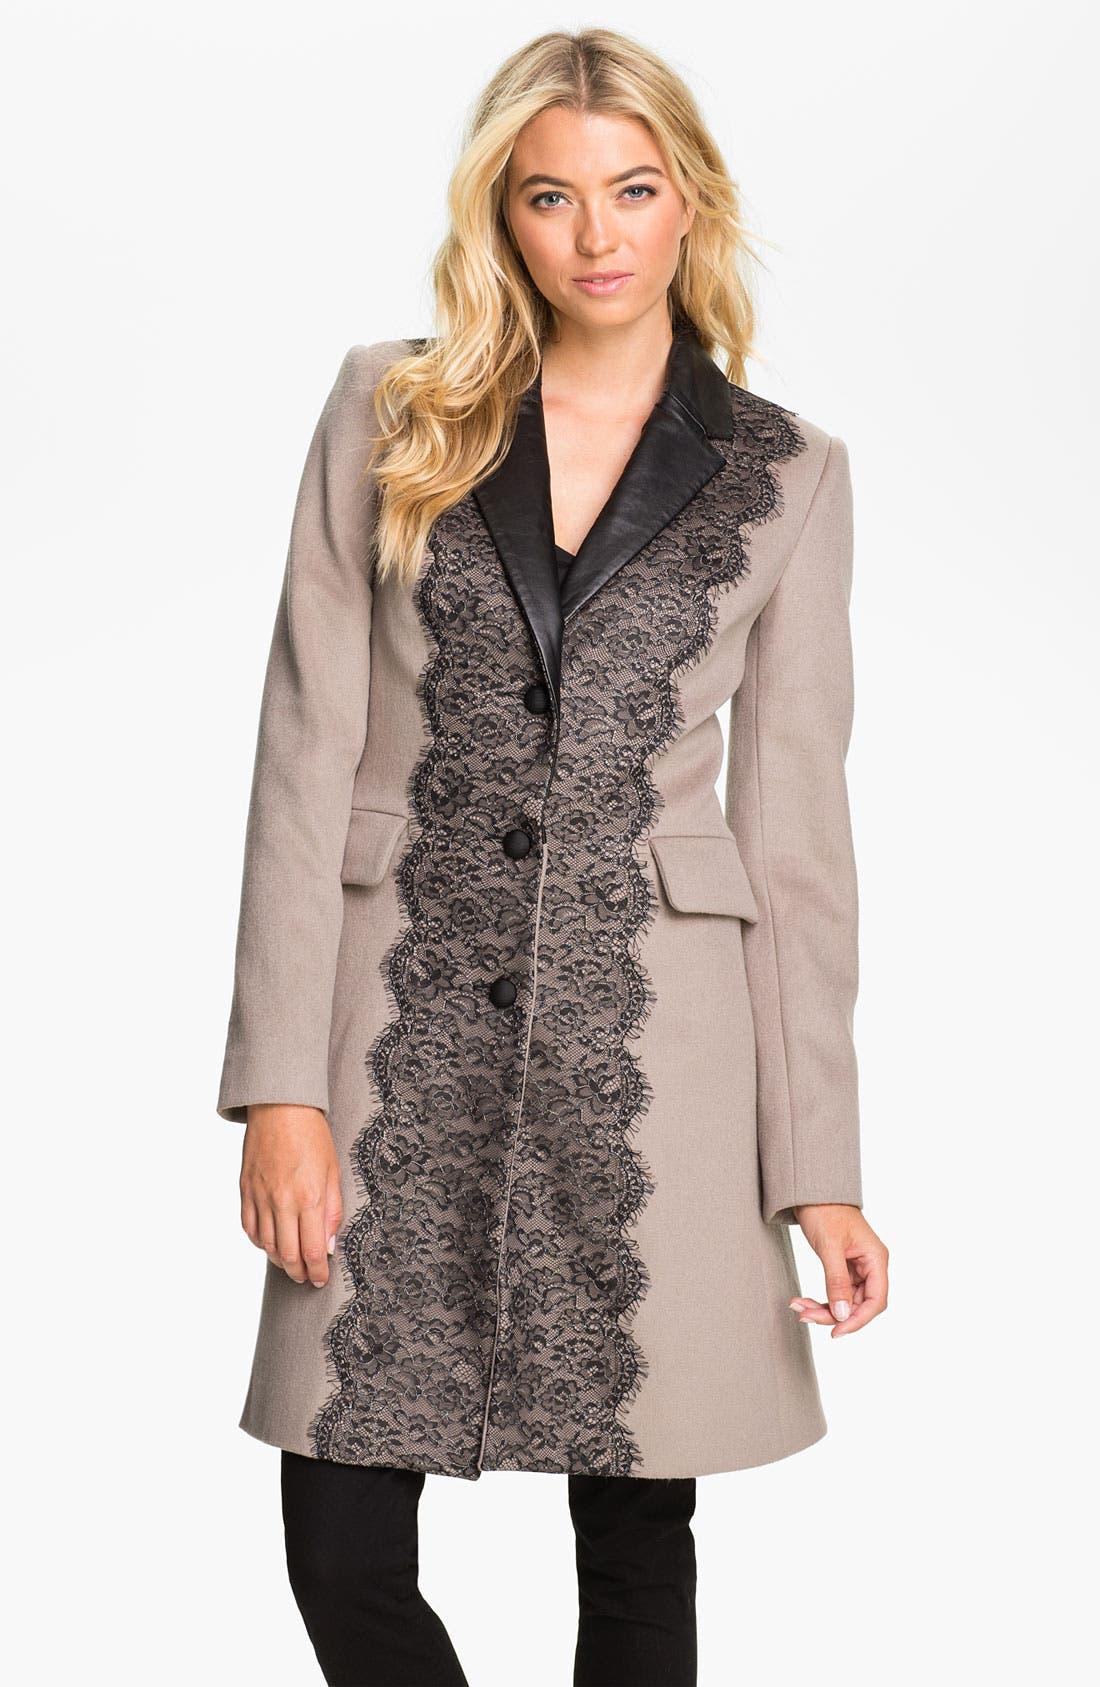 Main Image - Badgley Mischka 'Madeline' Coat